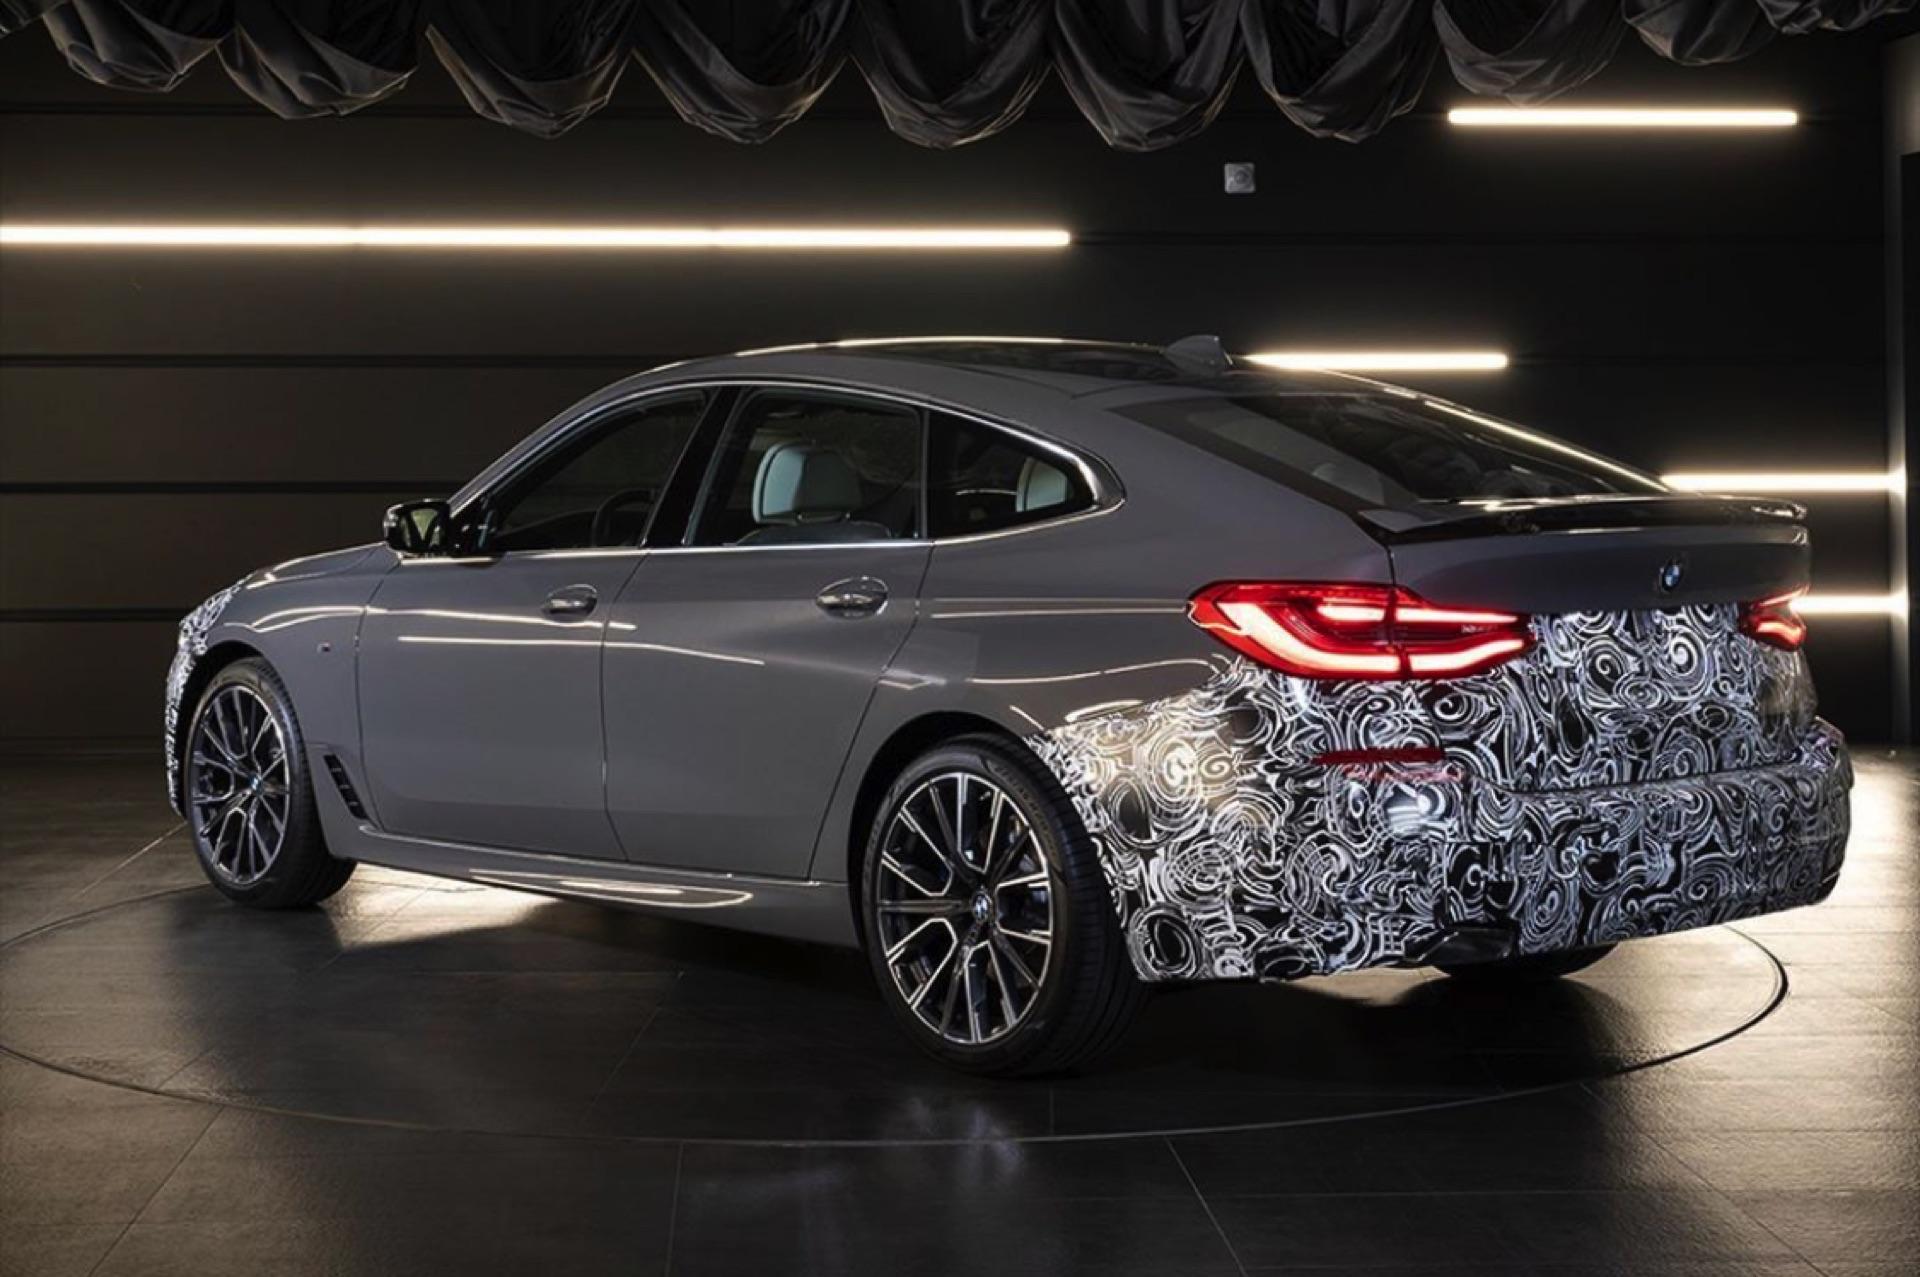 2020 BMW 6er GT Facelift G32 LCI Teaser 01